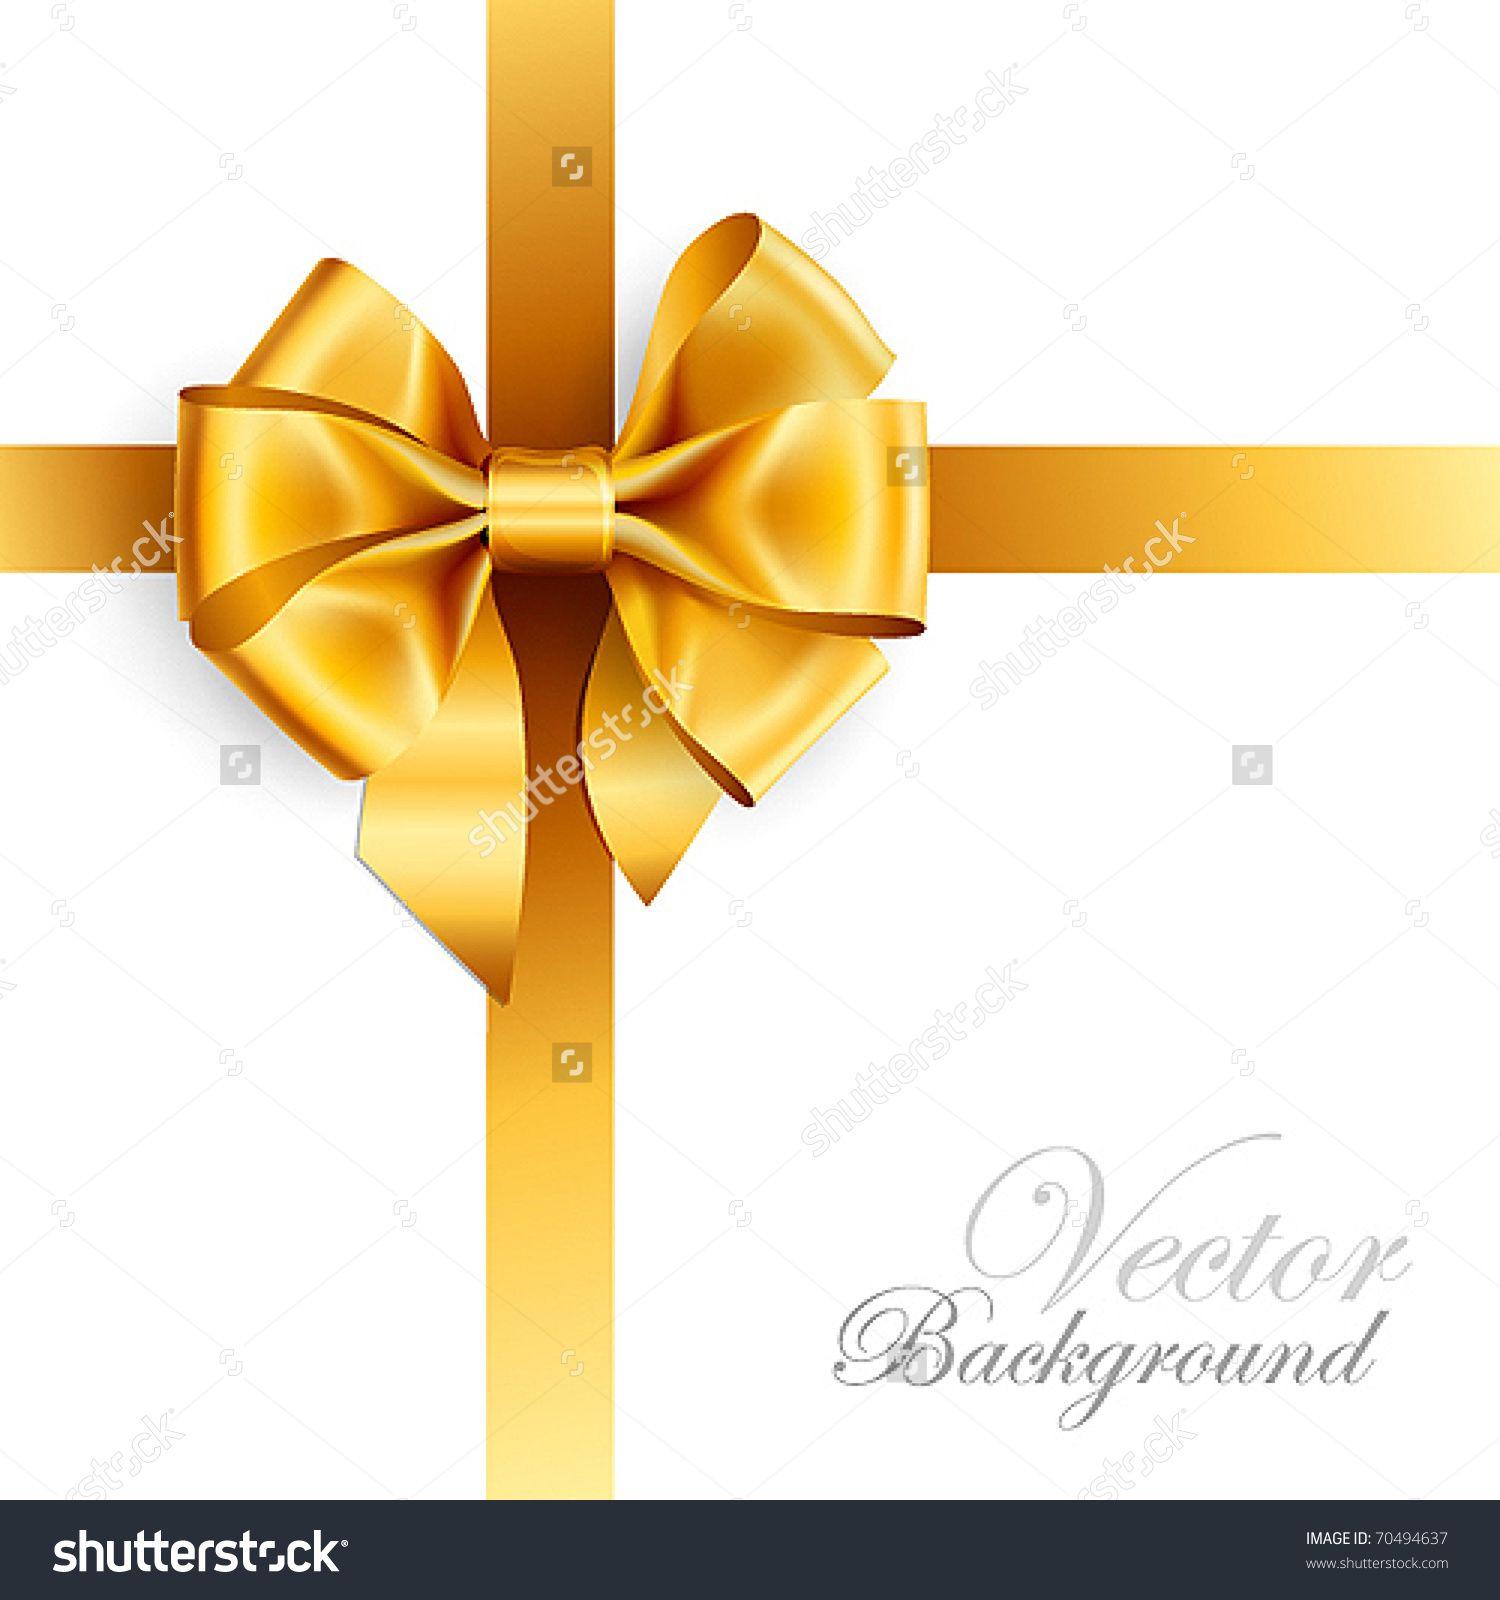 Stock Vector Golden Bow Isolated On White Vector Illustration 70494637 Jpg Izobrazhenie Jpeg 1500 1600 Pikselov Bow Vector Gold Christmas Bows Gift Bows